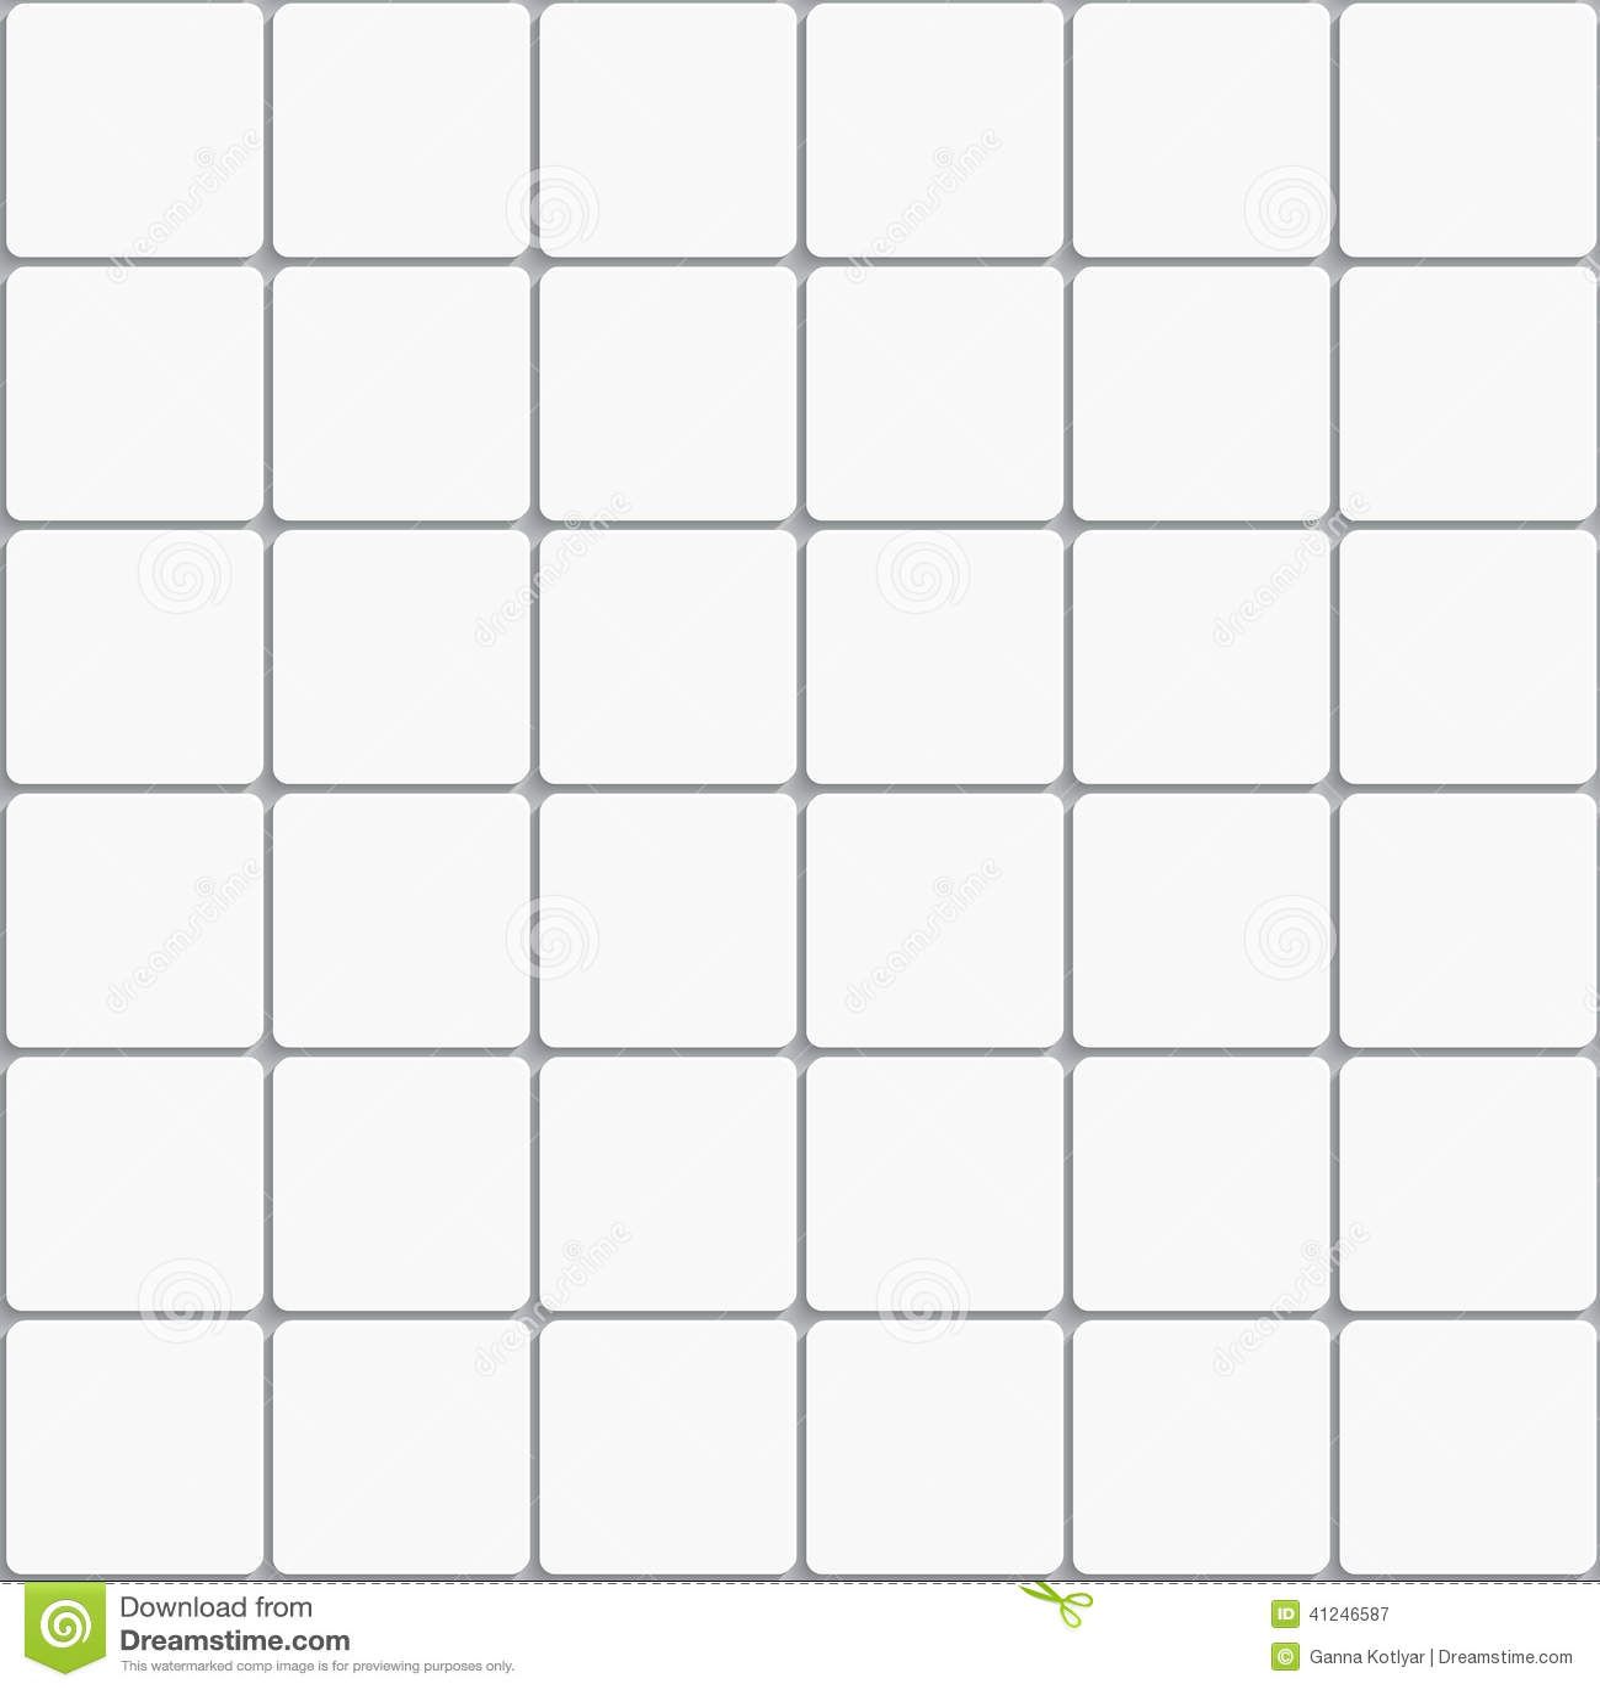 Backsplash Subway Tiles For Kitchen Seamless White Square Ceramic Tiles Background Stock